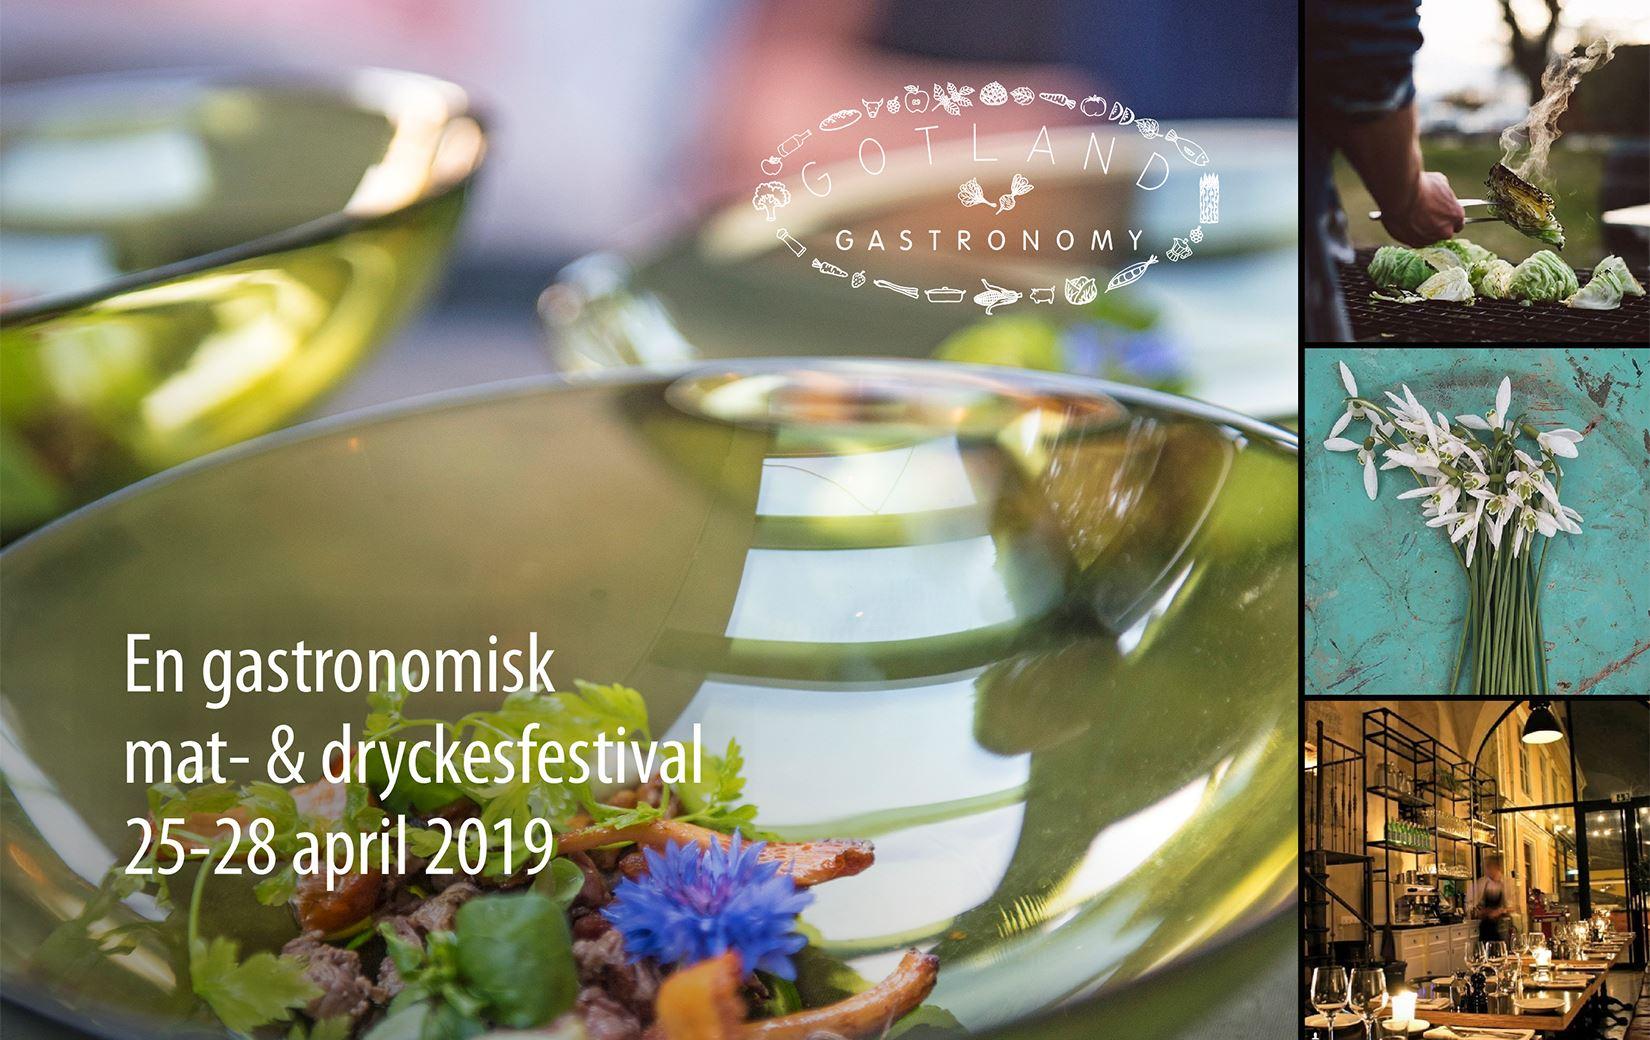 Gotland Gastronomy Package